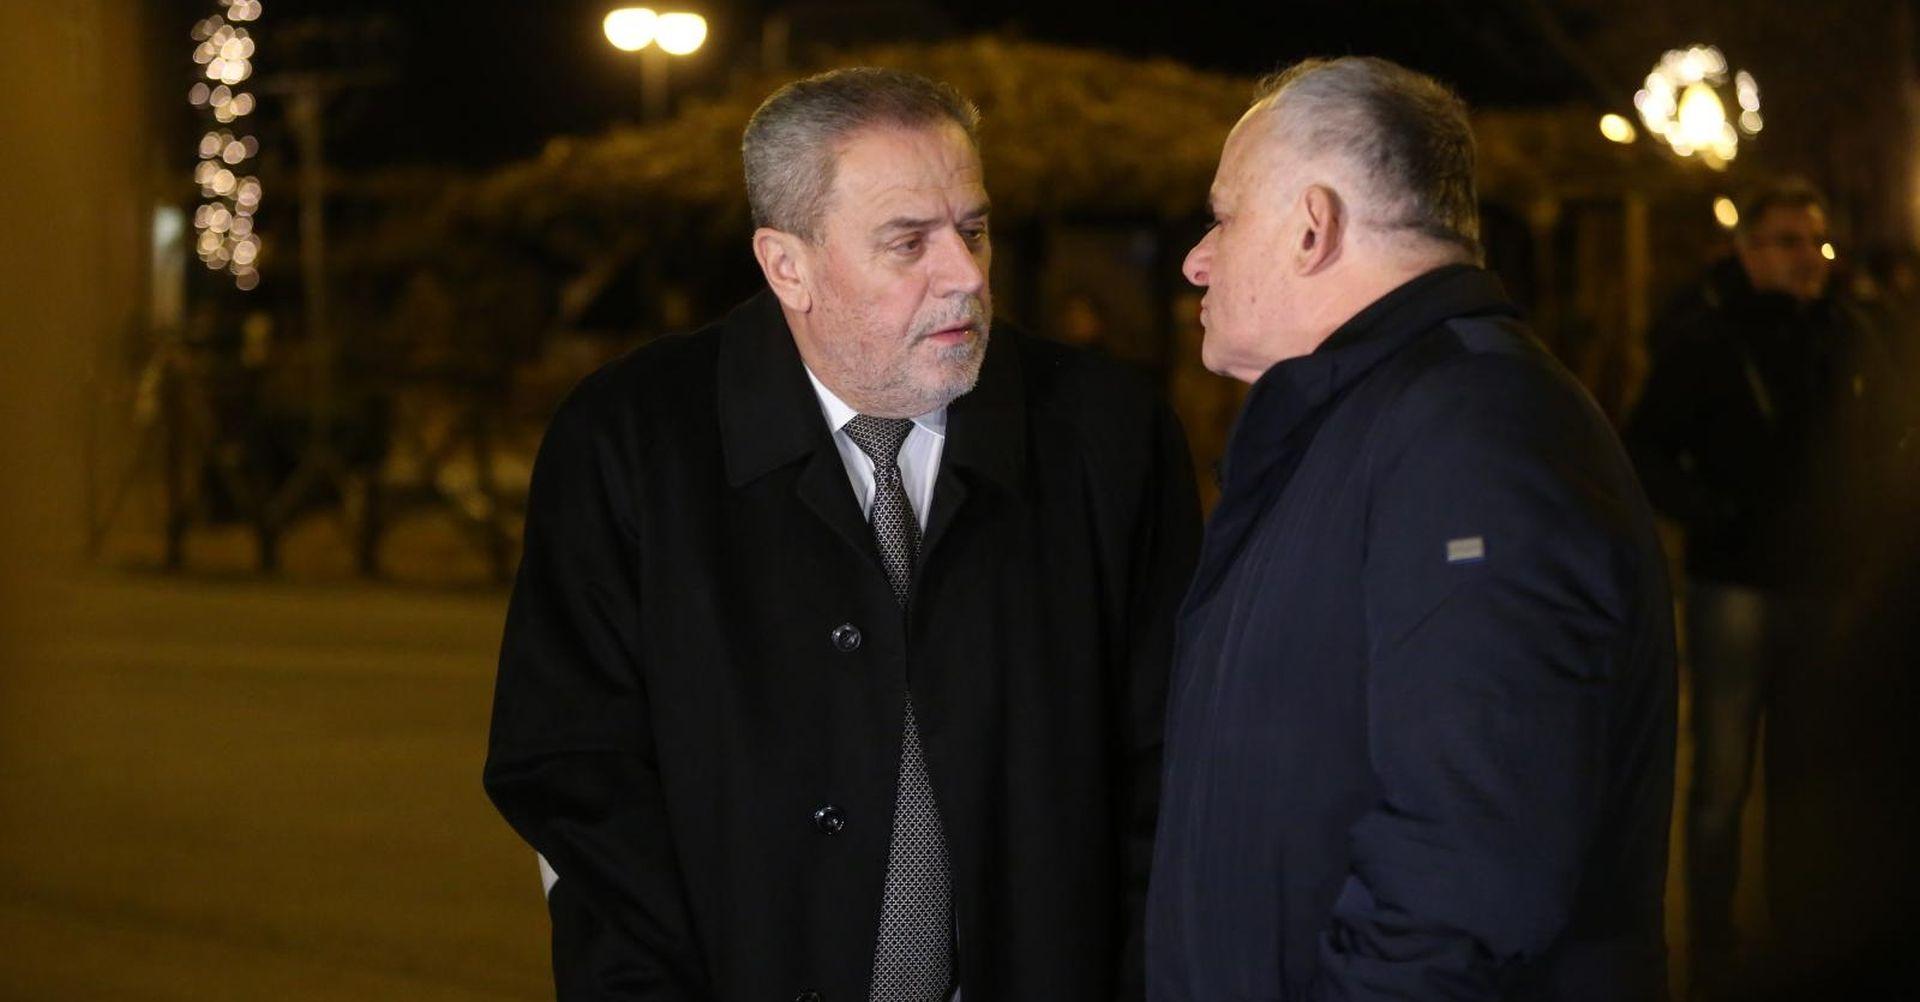 Bandić čestitao Božić, pozvao na bliskost i dobrotu